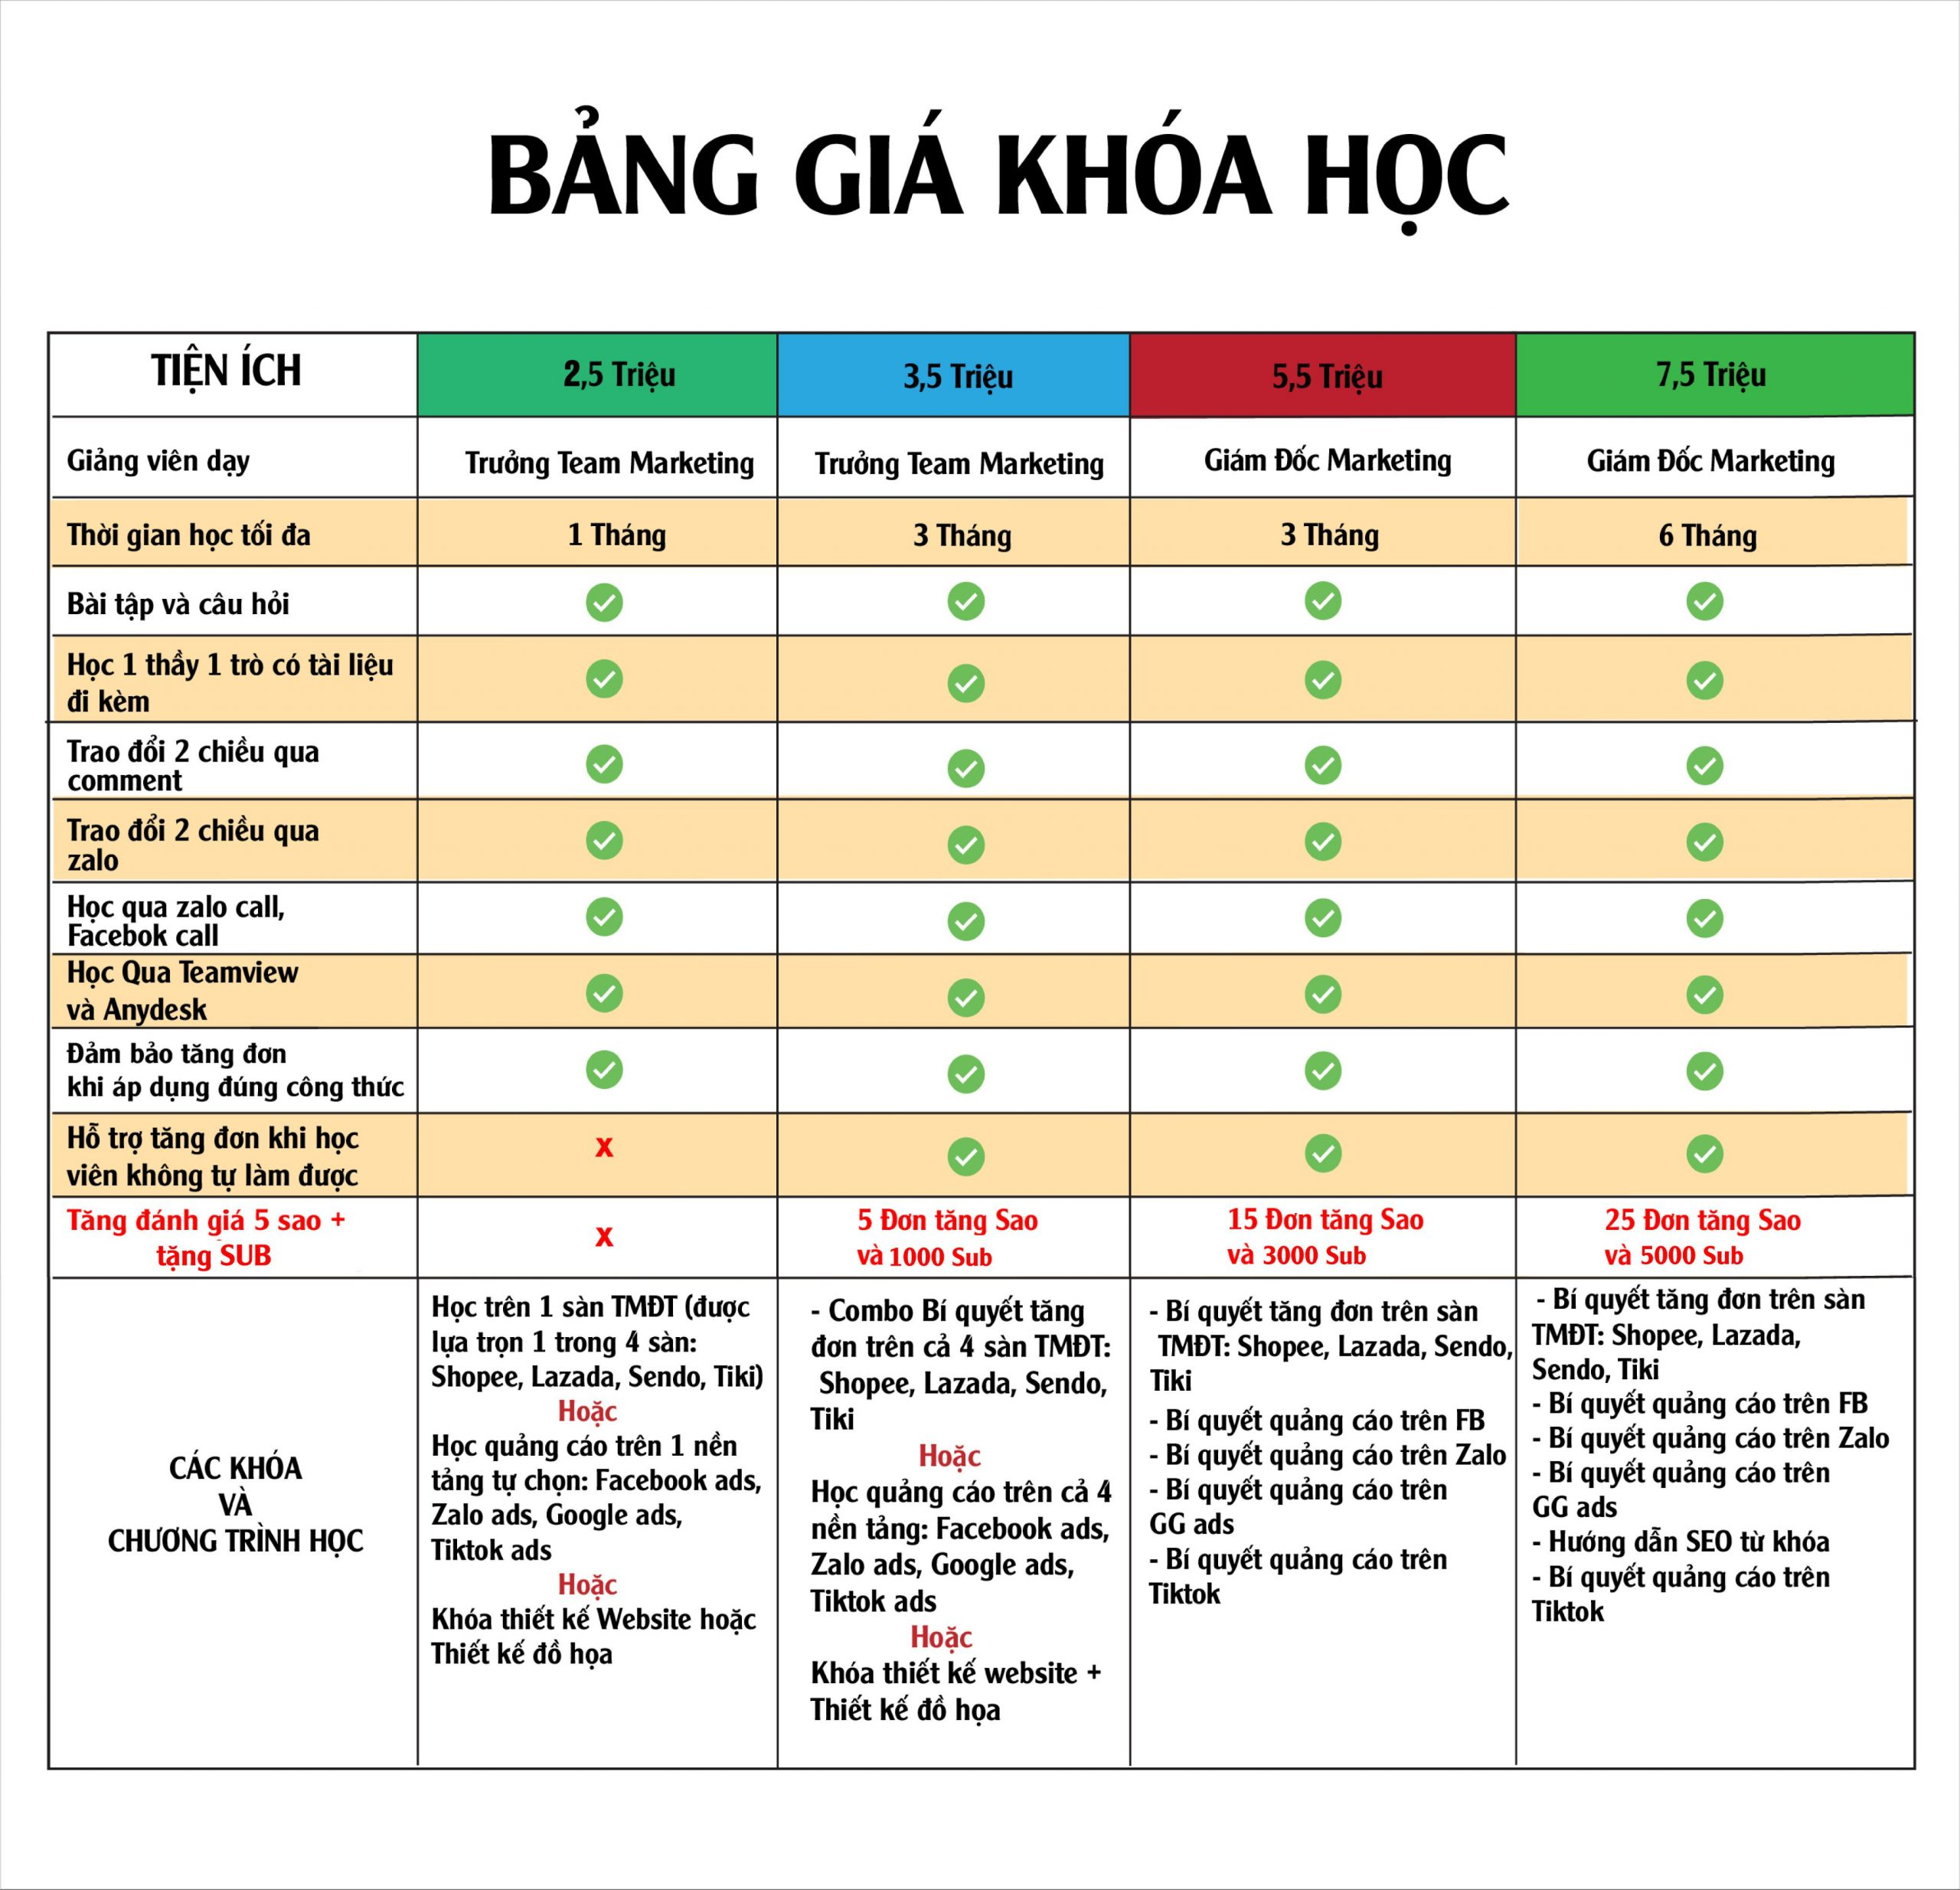 BANG GIA KHOA HOC scaled